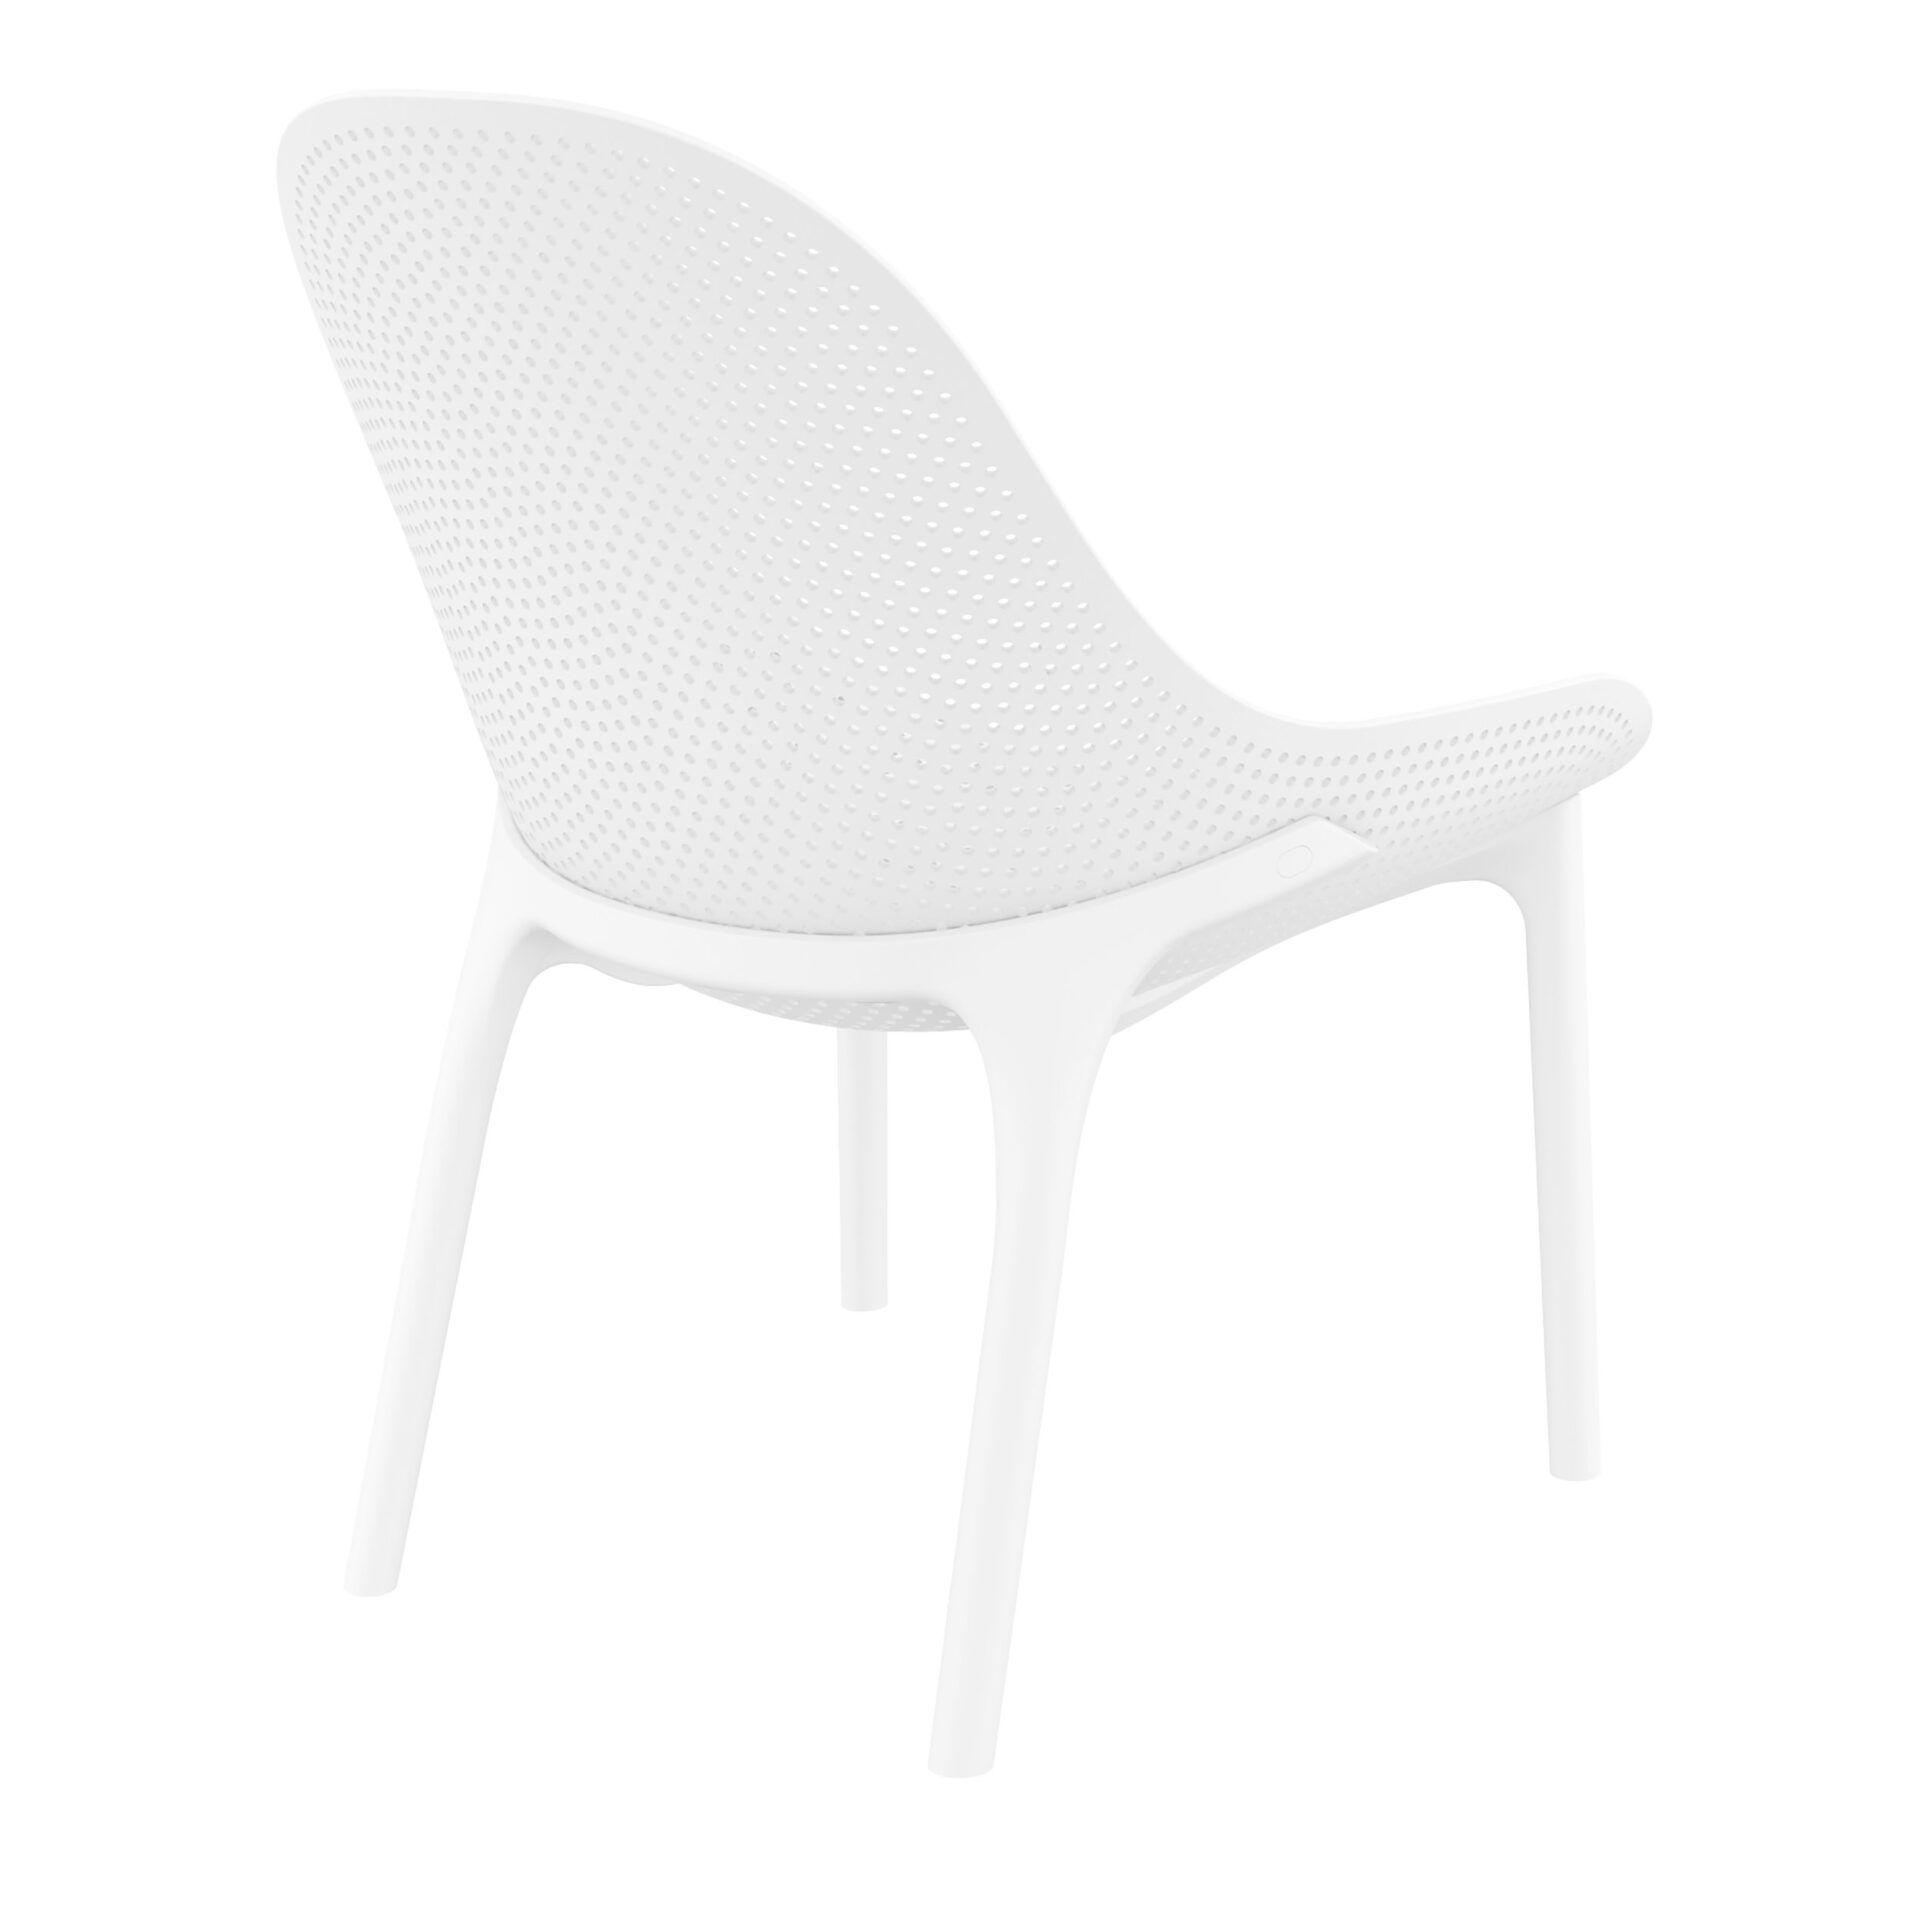 outdoor seating polypropylene sky lounge white back side